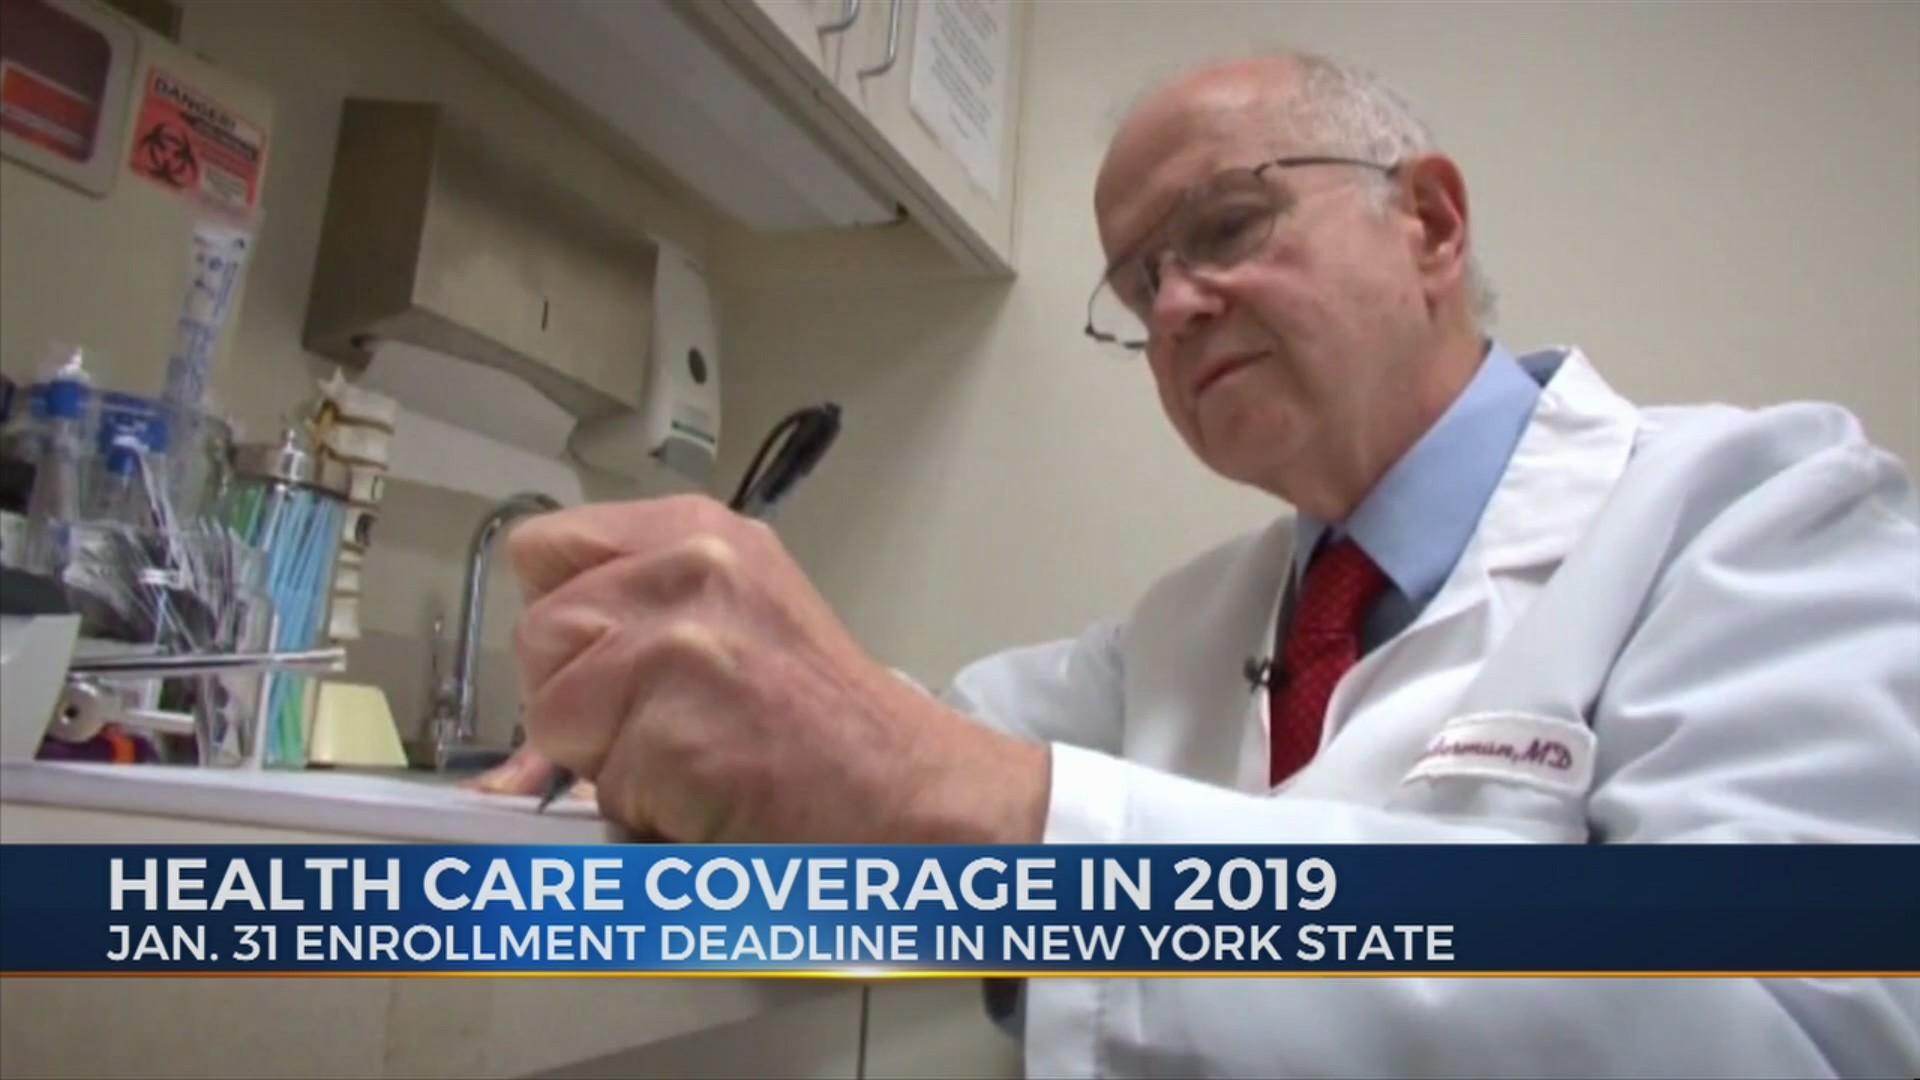 Health_Care_Coverage_in_2019_0_20181217232918